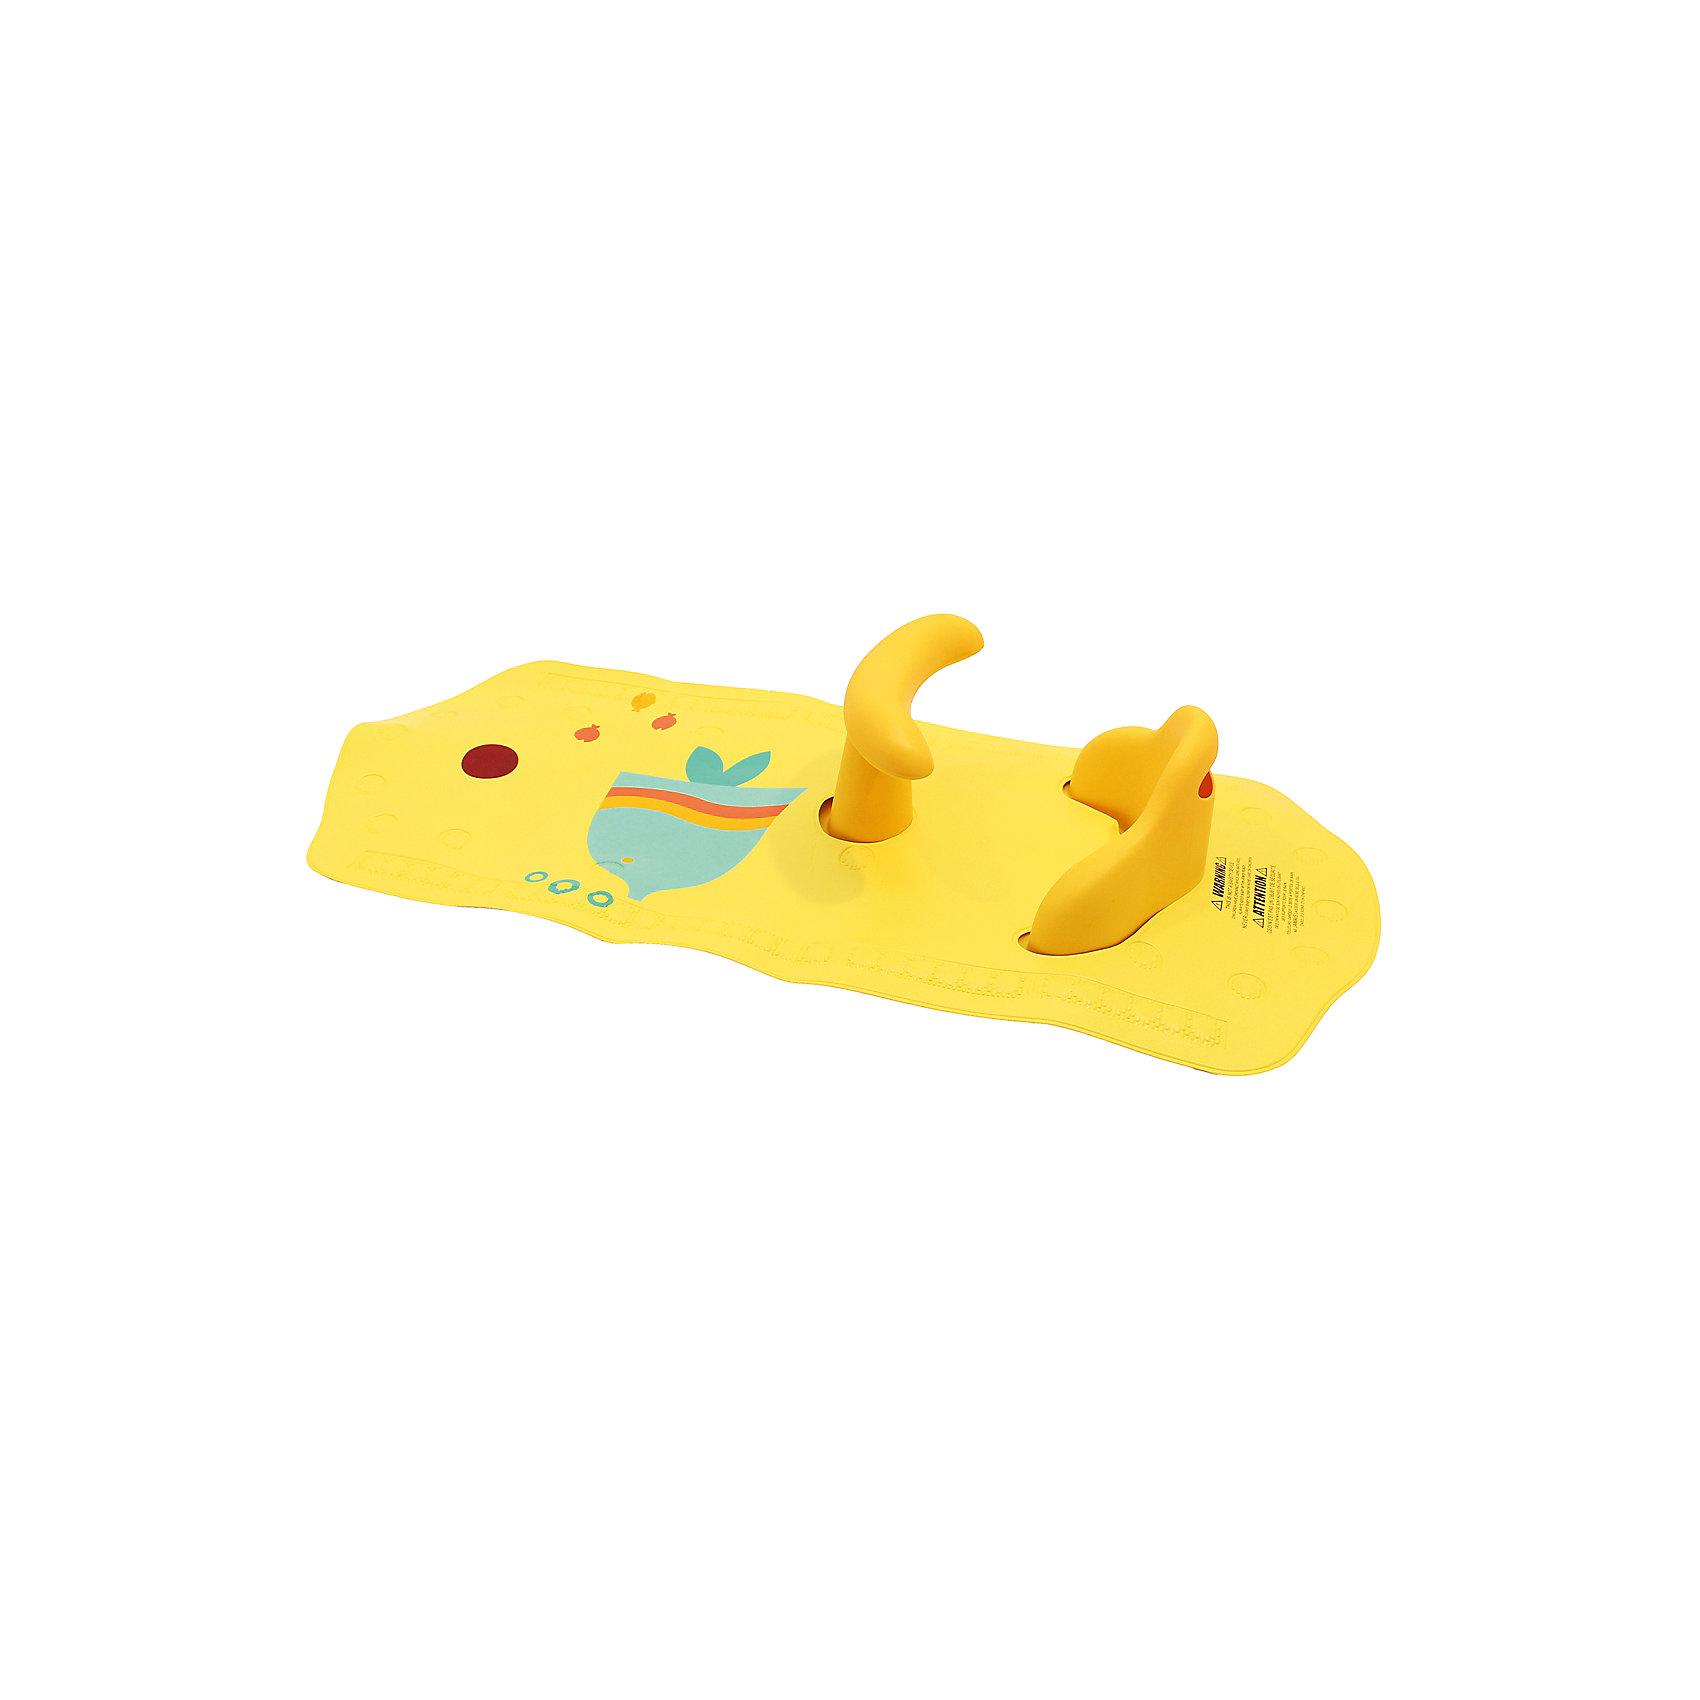 Roxy-Kids Коврик для ванной со съемным стульчиком ROXY-KIDS, Рыбка круг для купания roxy kids flipper рыцарь fl006